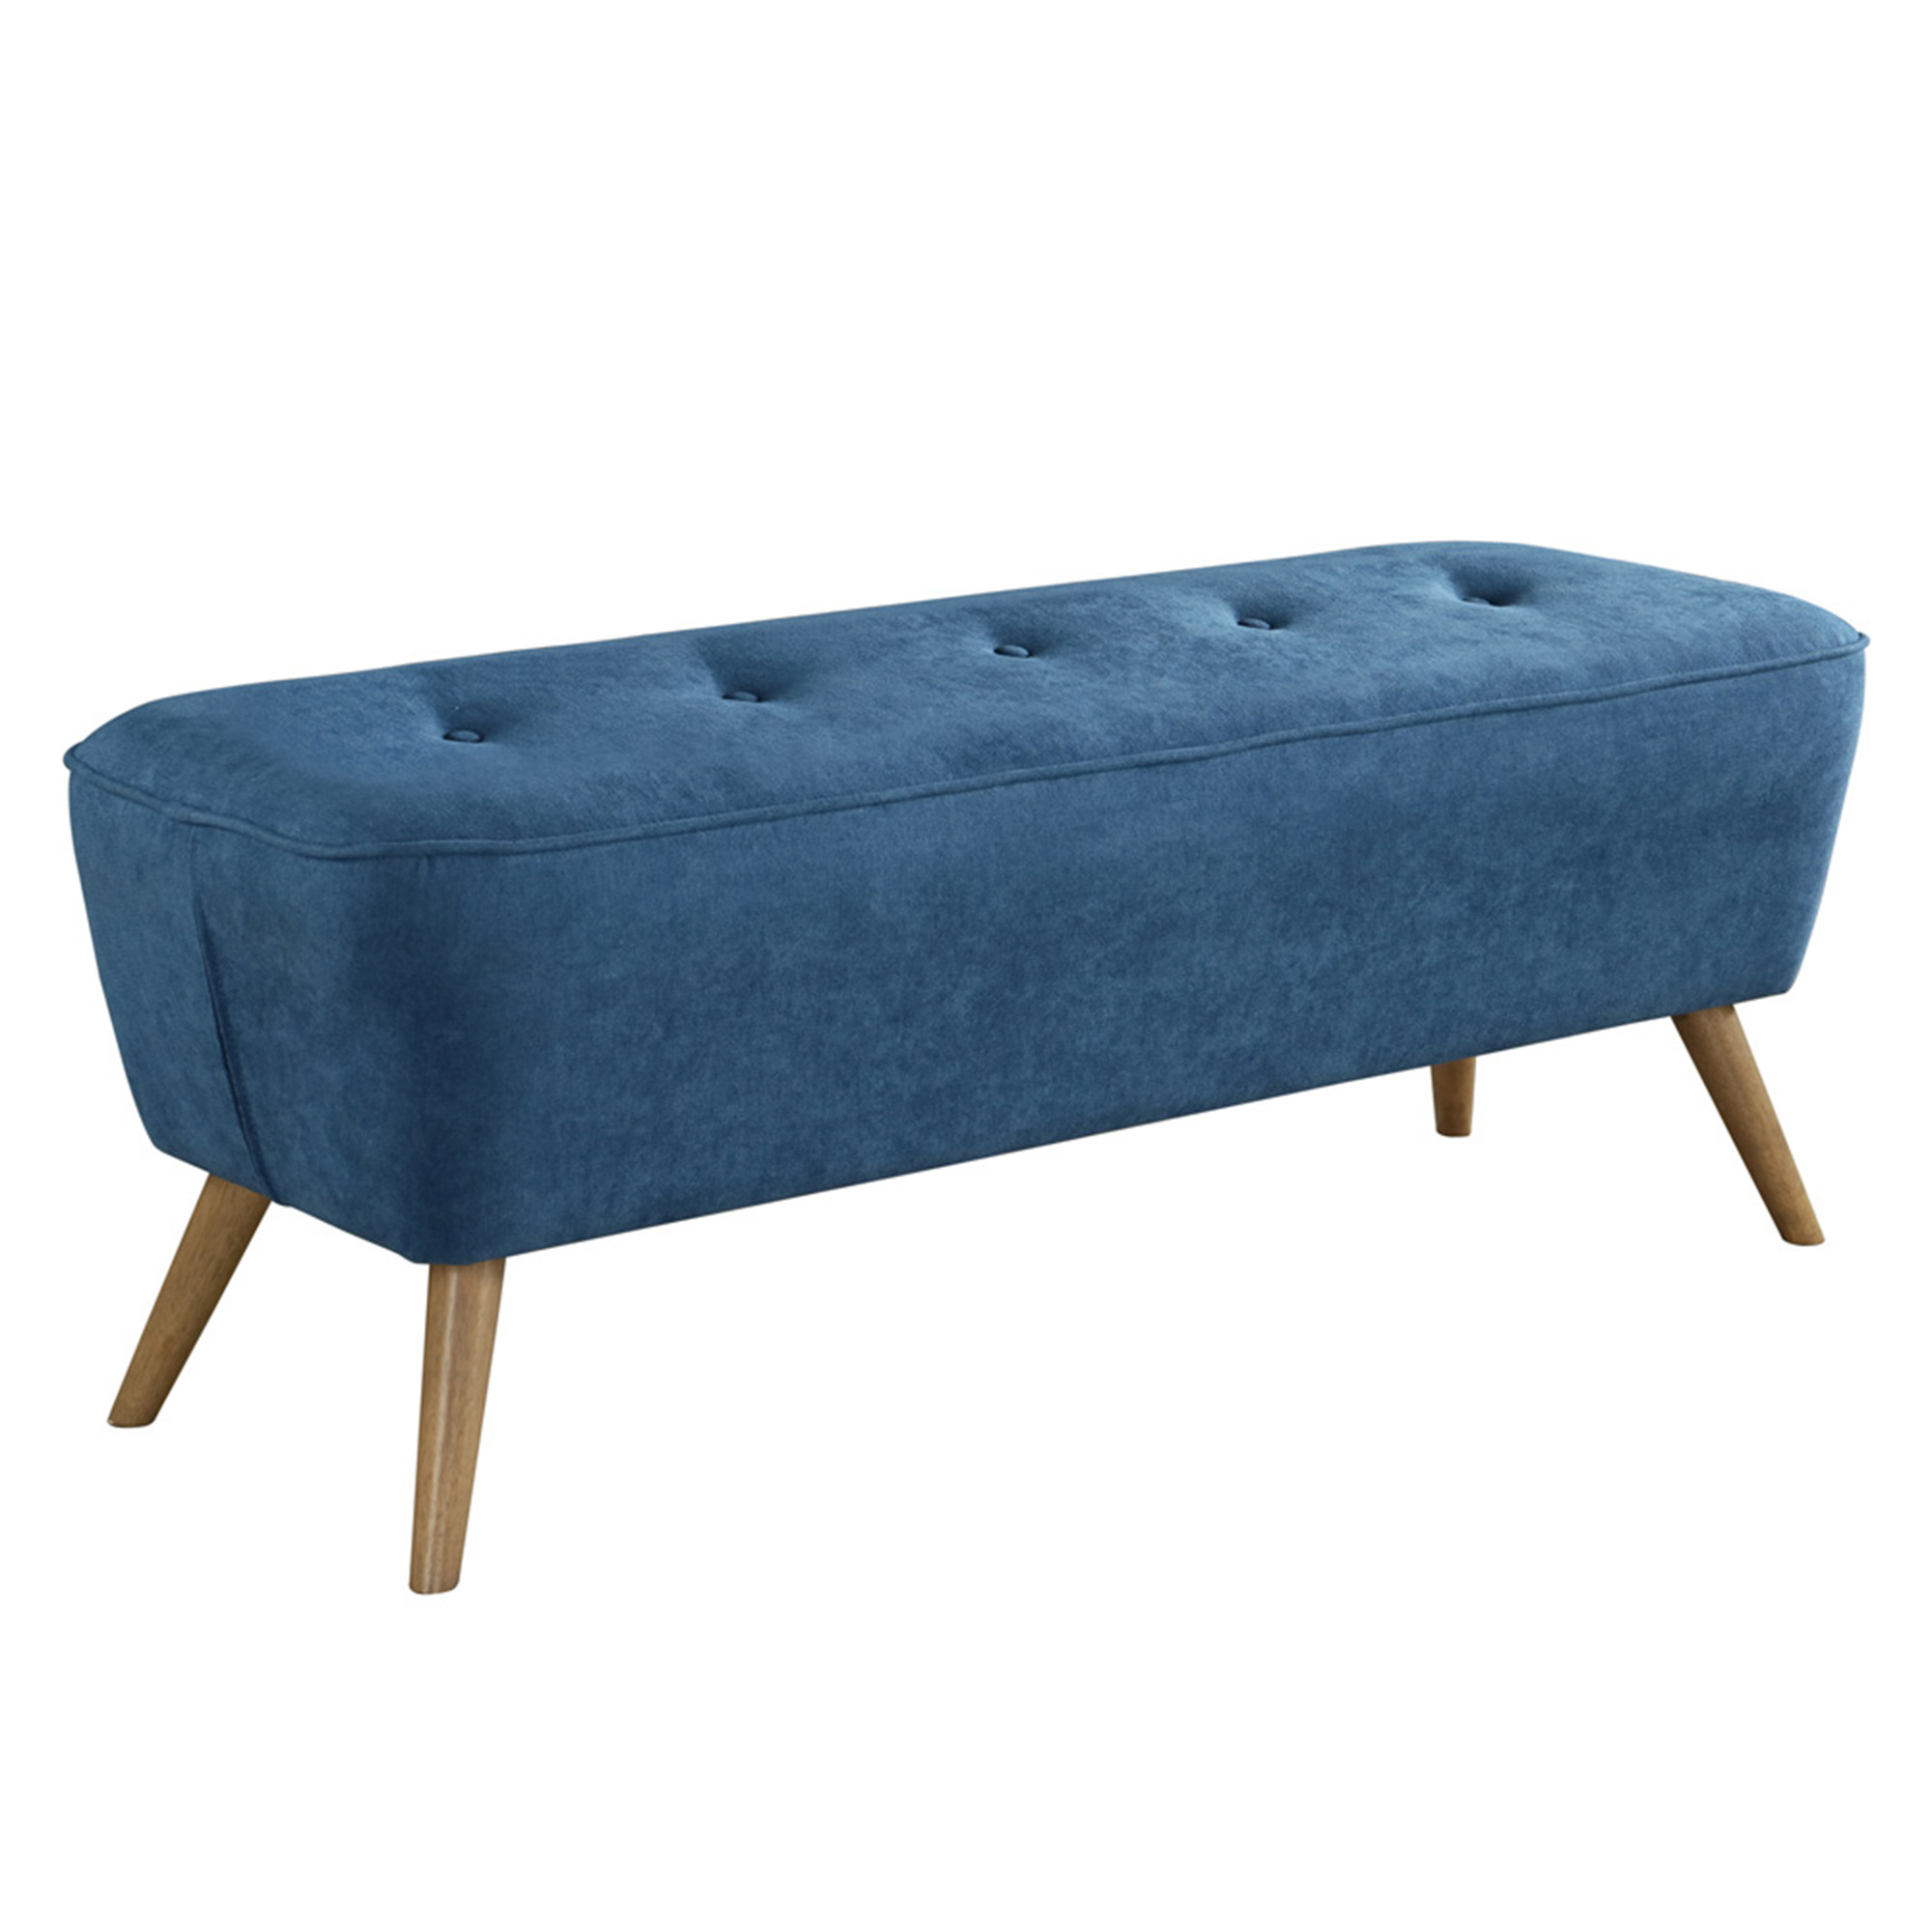 Mid-Century Fabric Bench/Ottoman in Blue